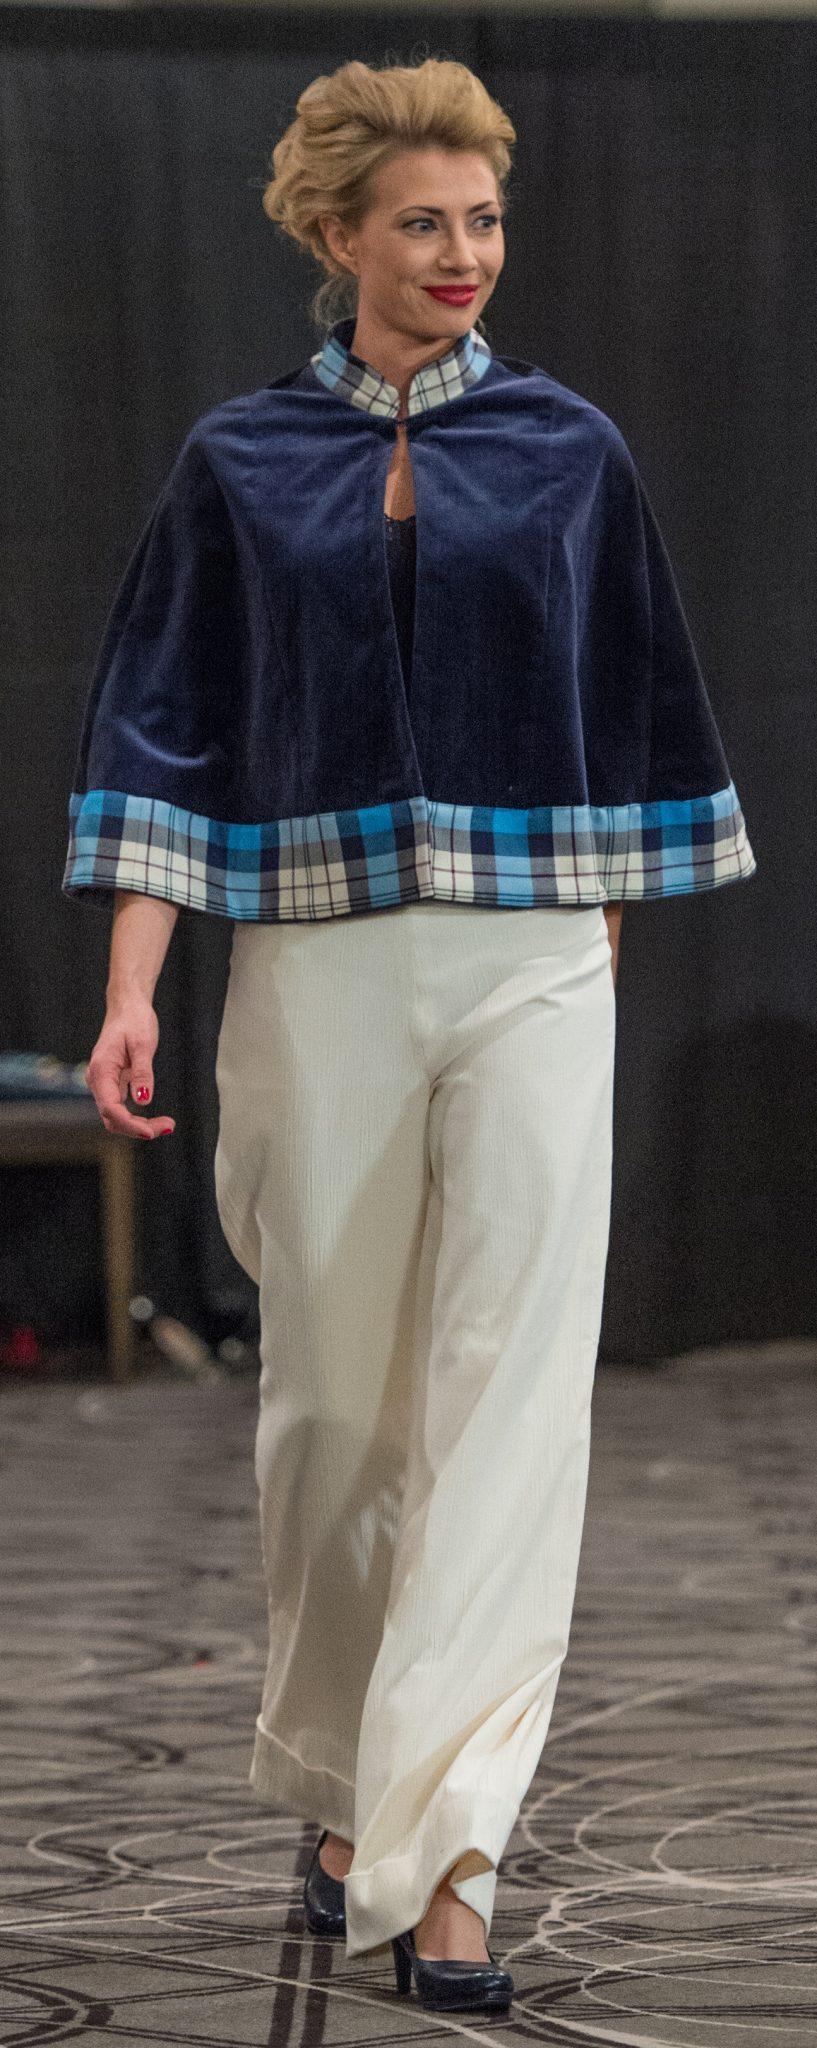 Veronica MacIsaac Prince George 2014-0307